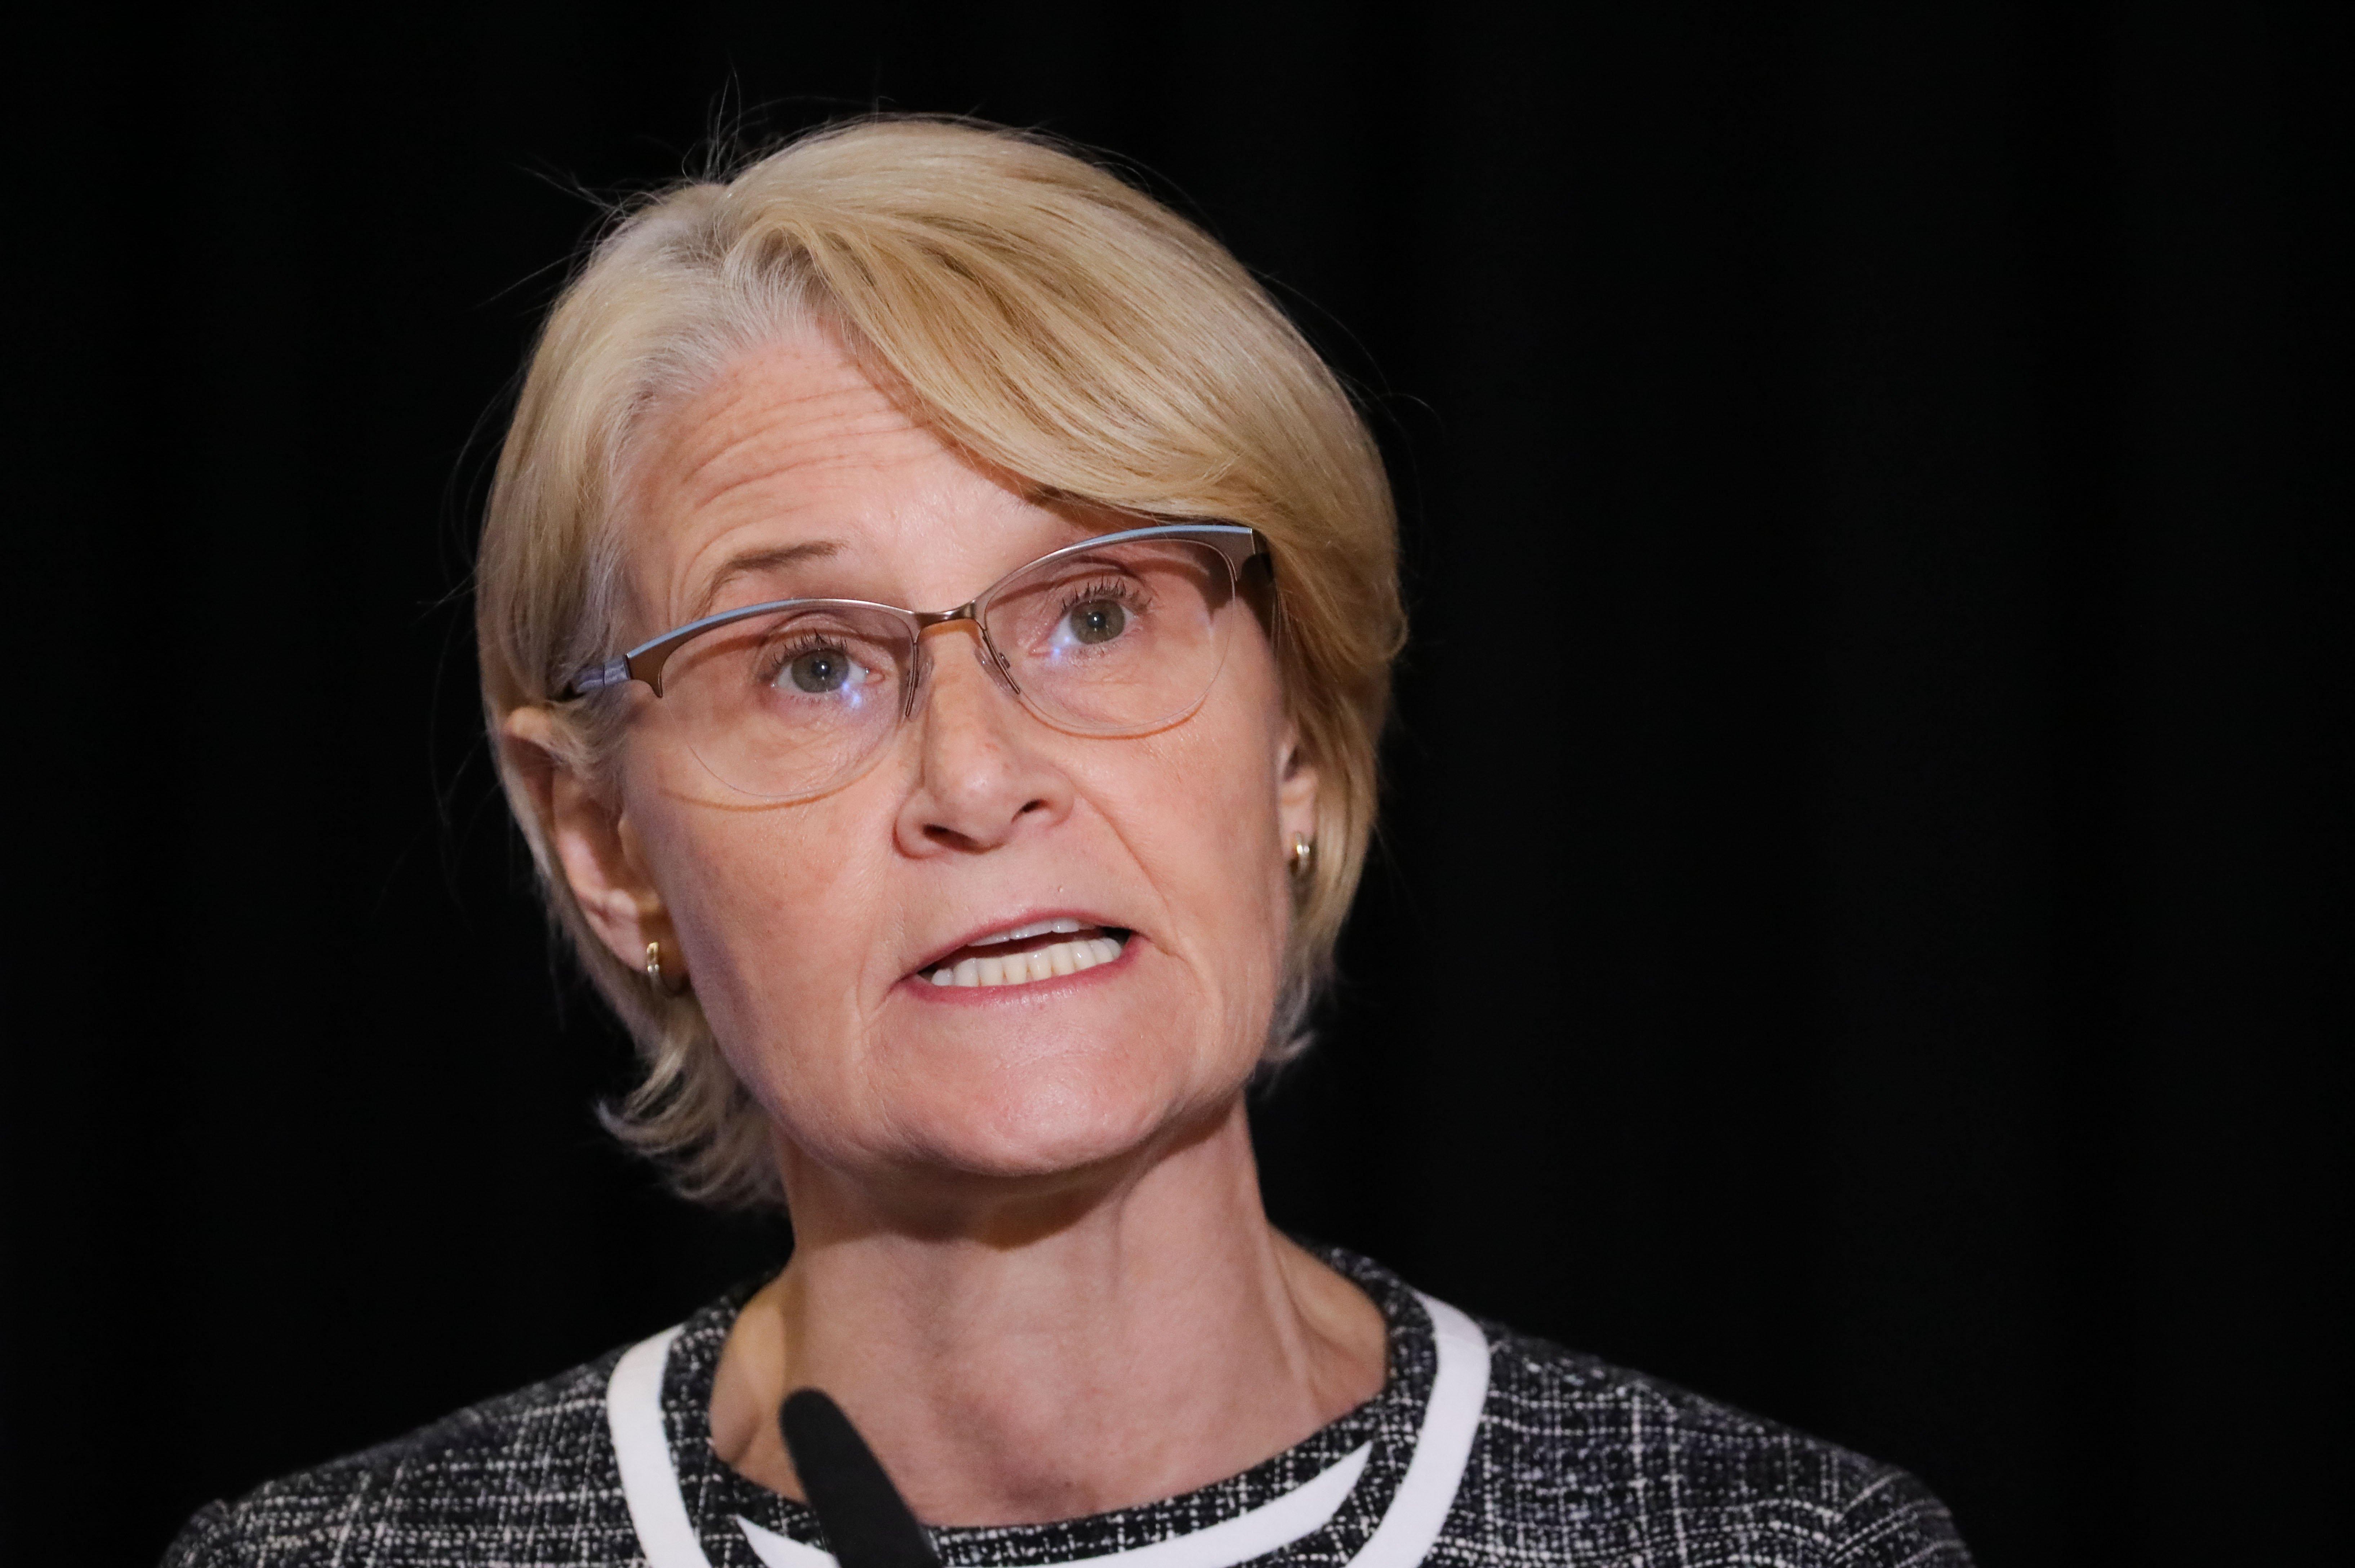 Muckamore Hospital: Health trust chief 'profoundly regrets' leadership failings